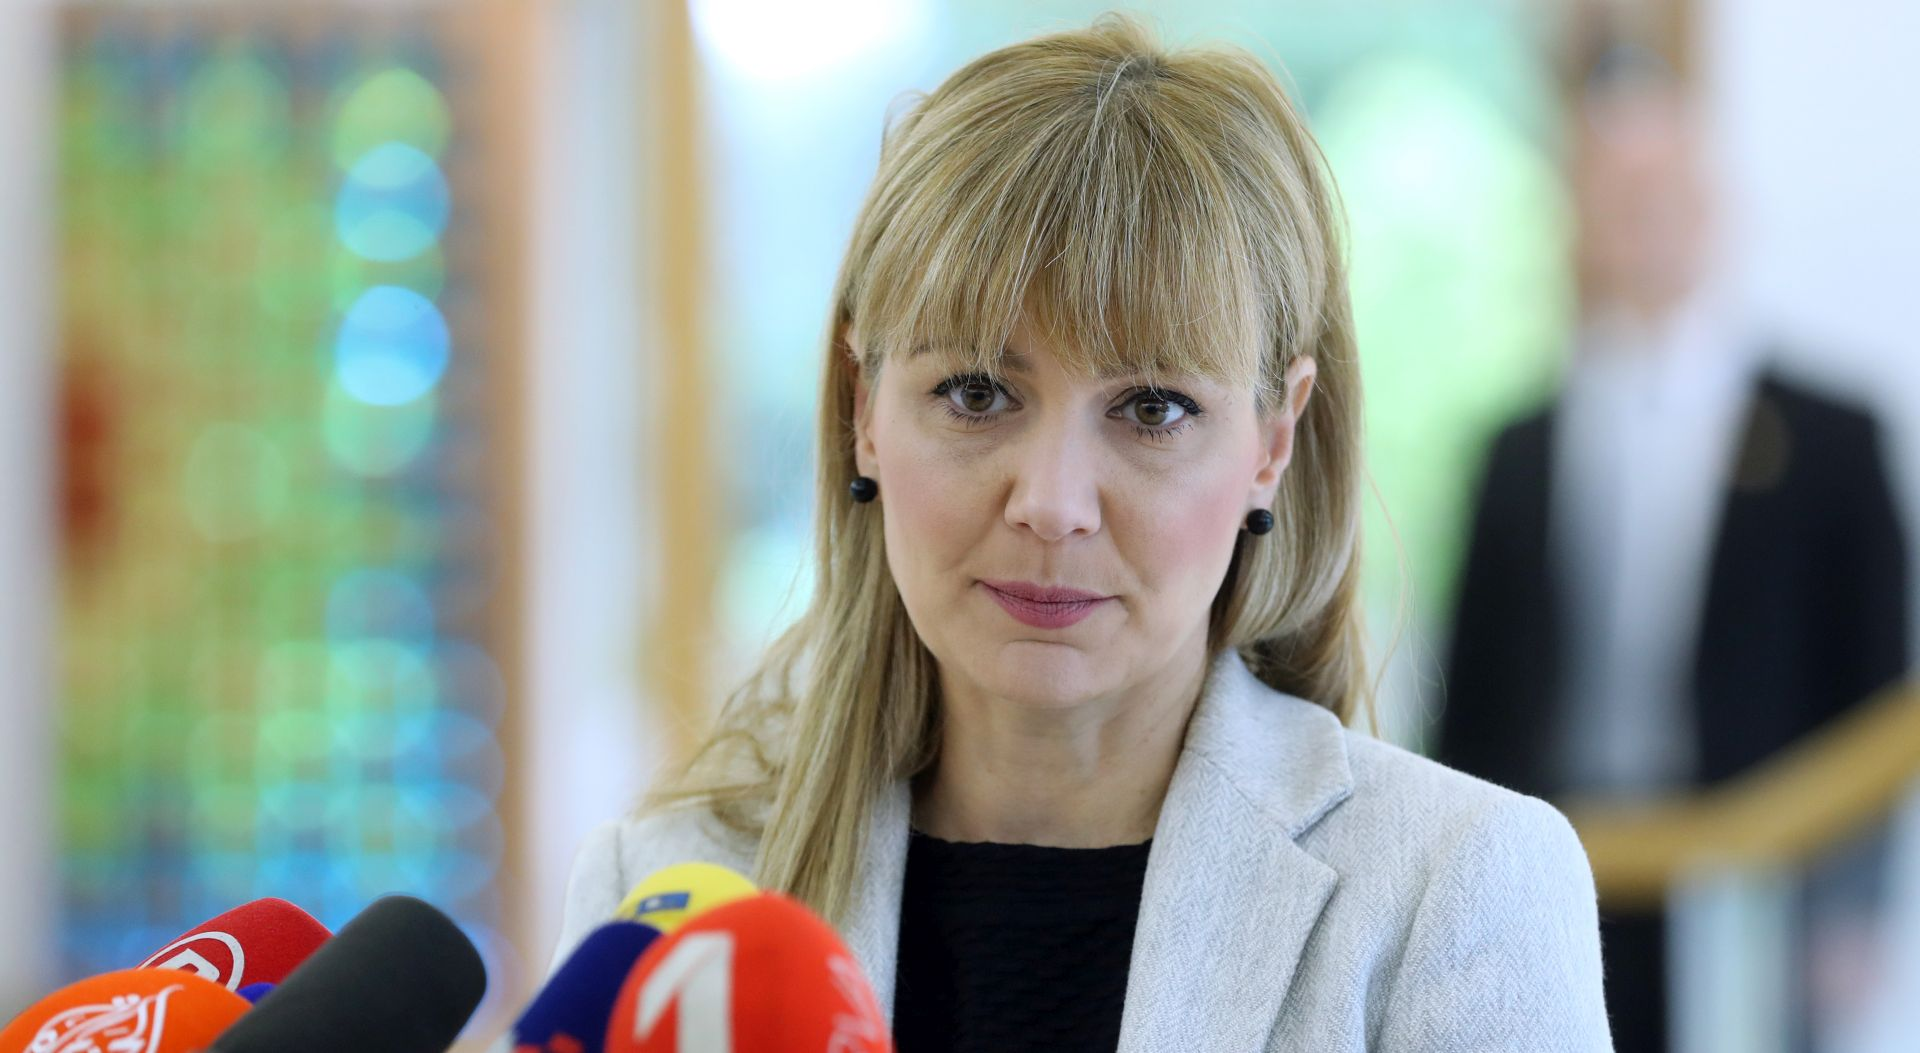 ESIH 'Nije koalicija, radi se o programskoj suradnji s Bandićem i HDZ-om'